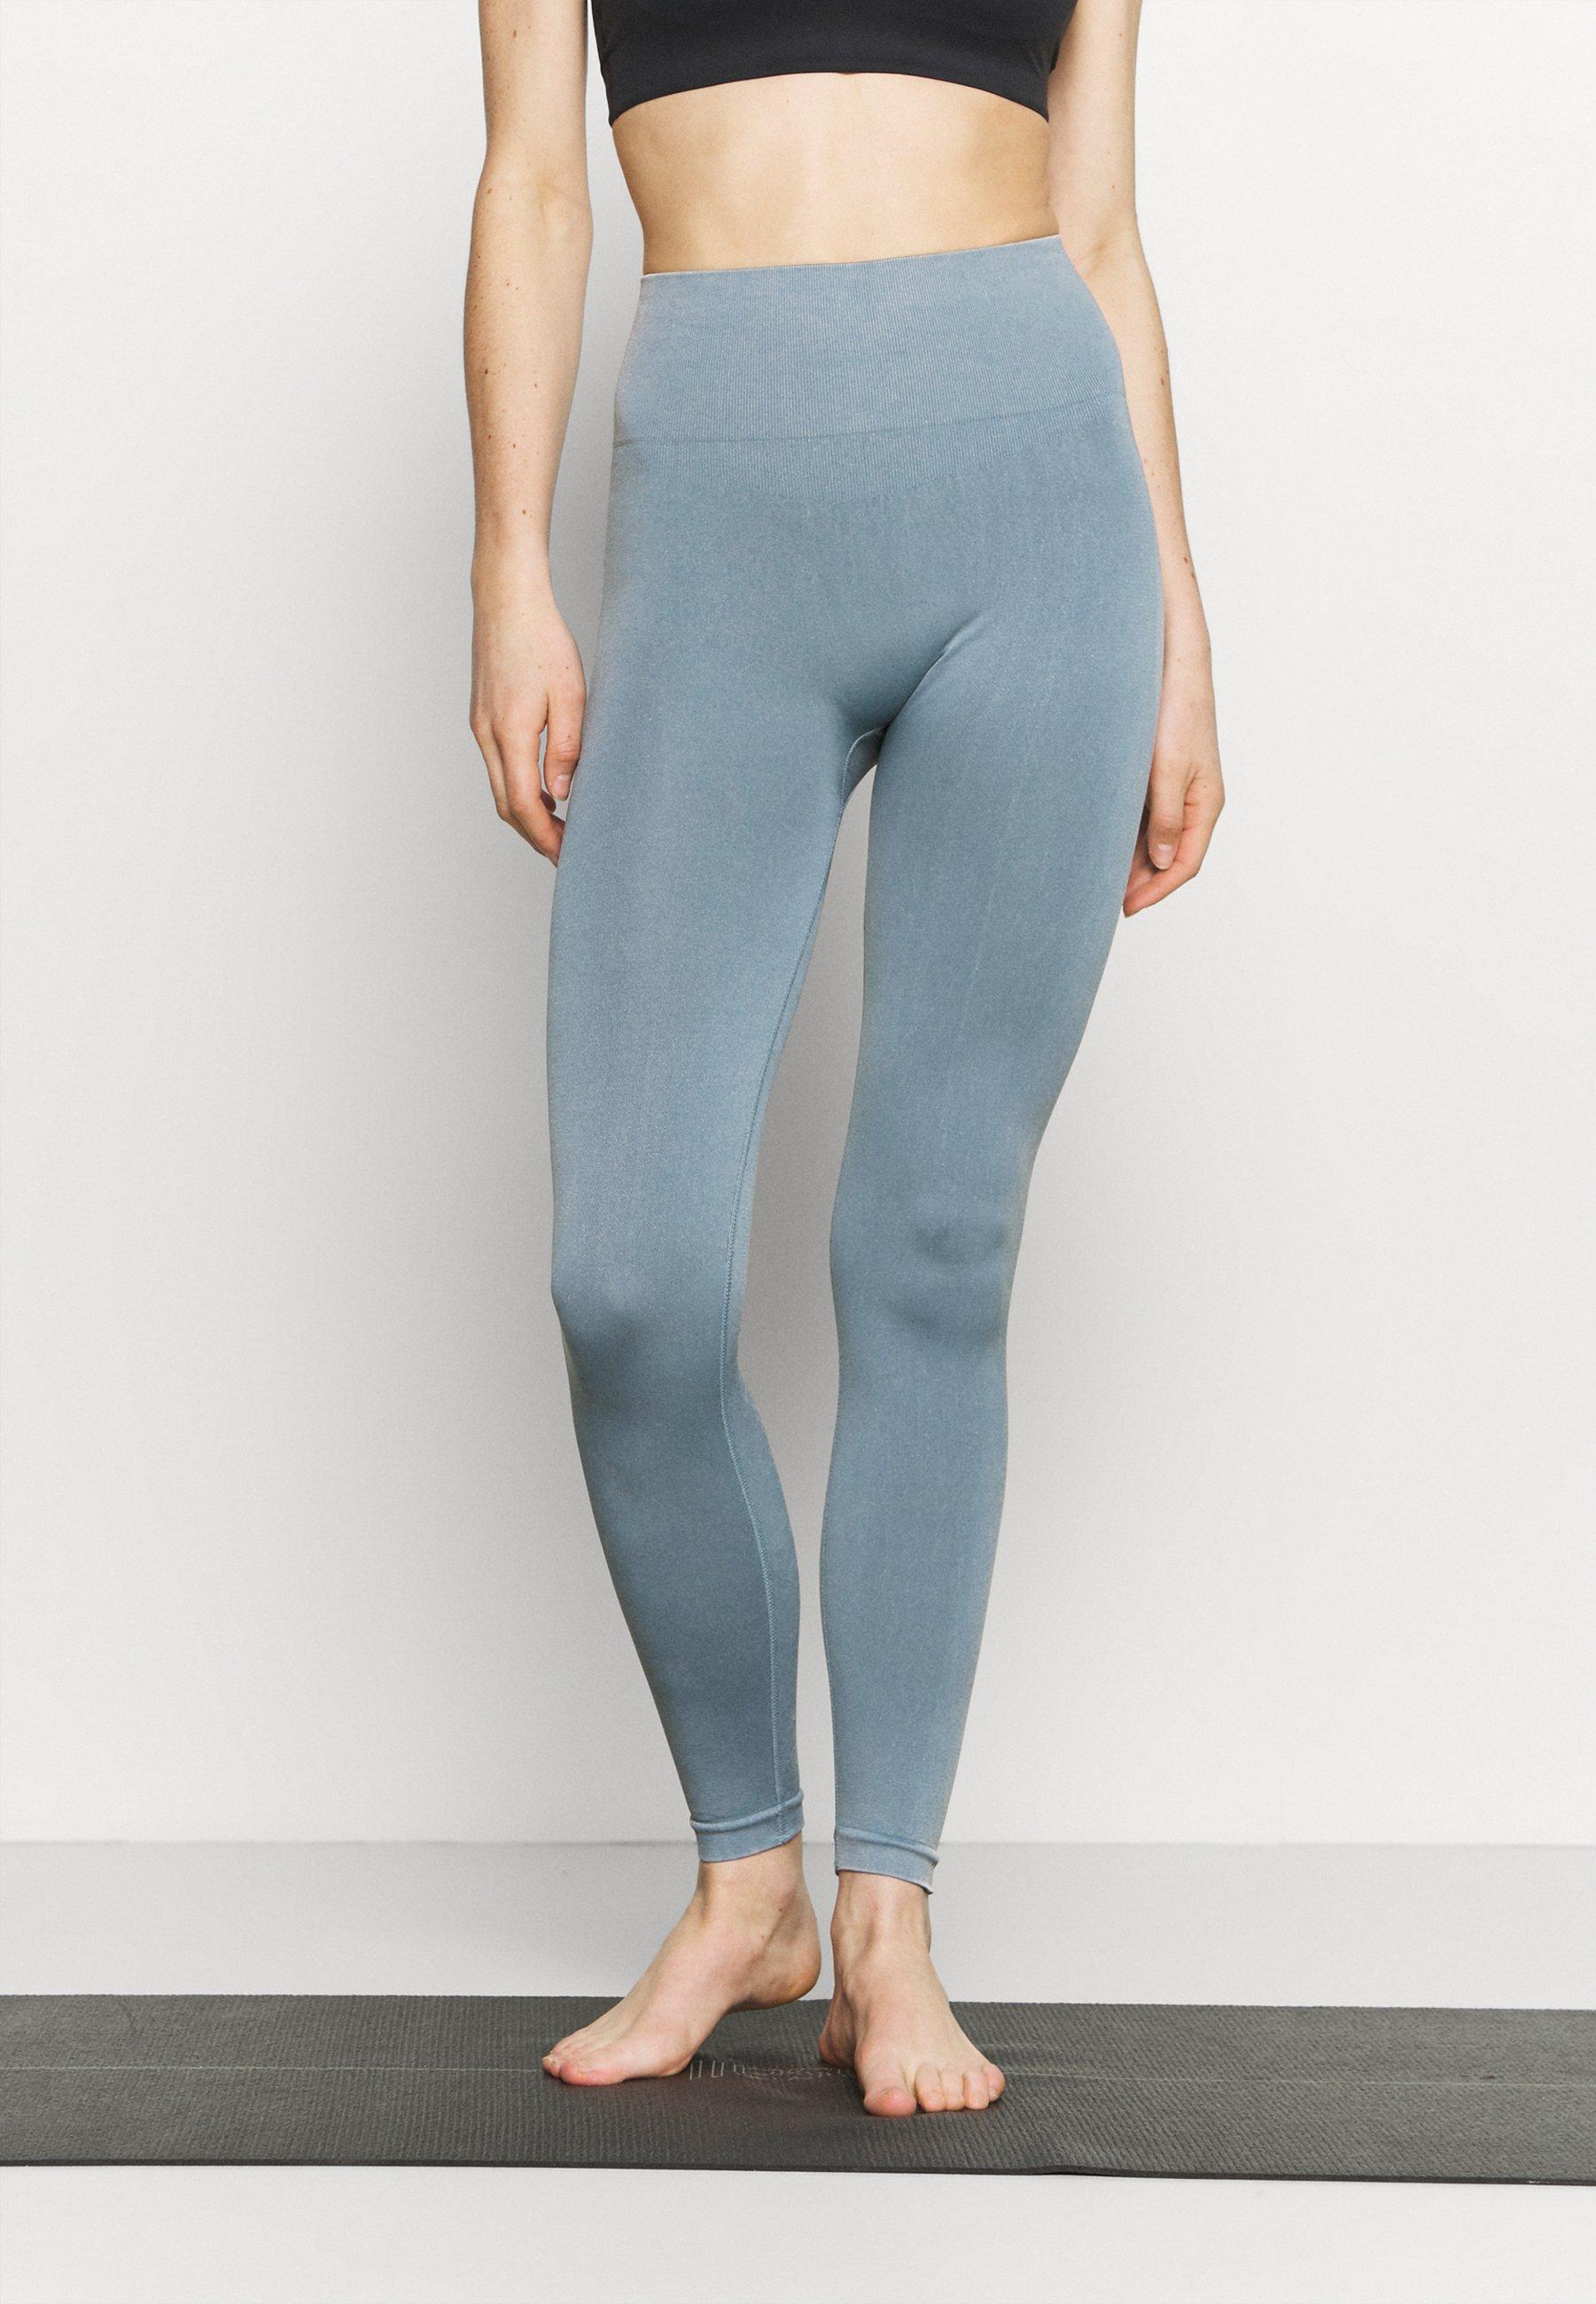 Femme FLEX LEGGING SEAMLESS - Collants